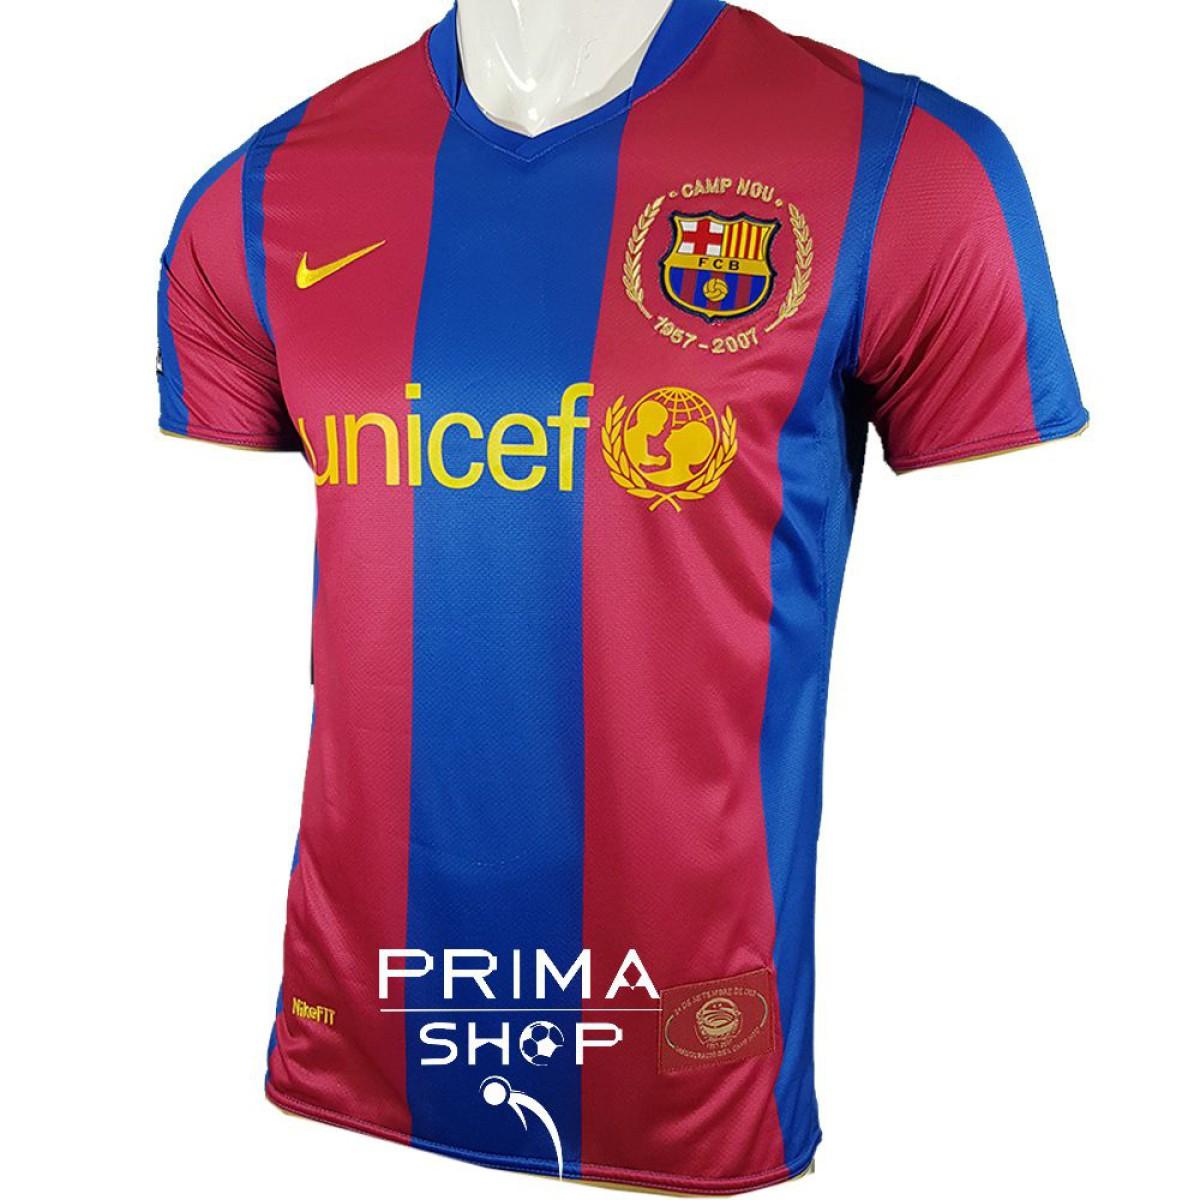 لباس کلاسیک بارسلونا 2008